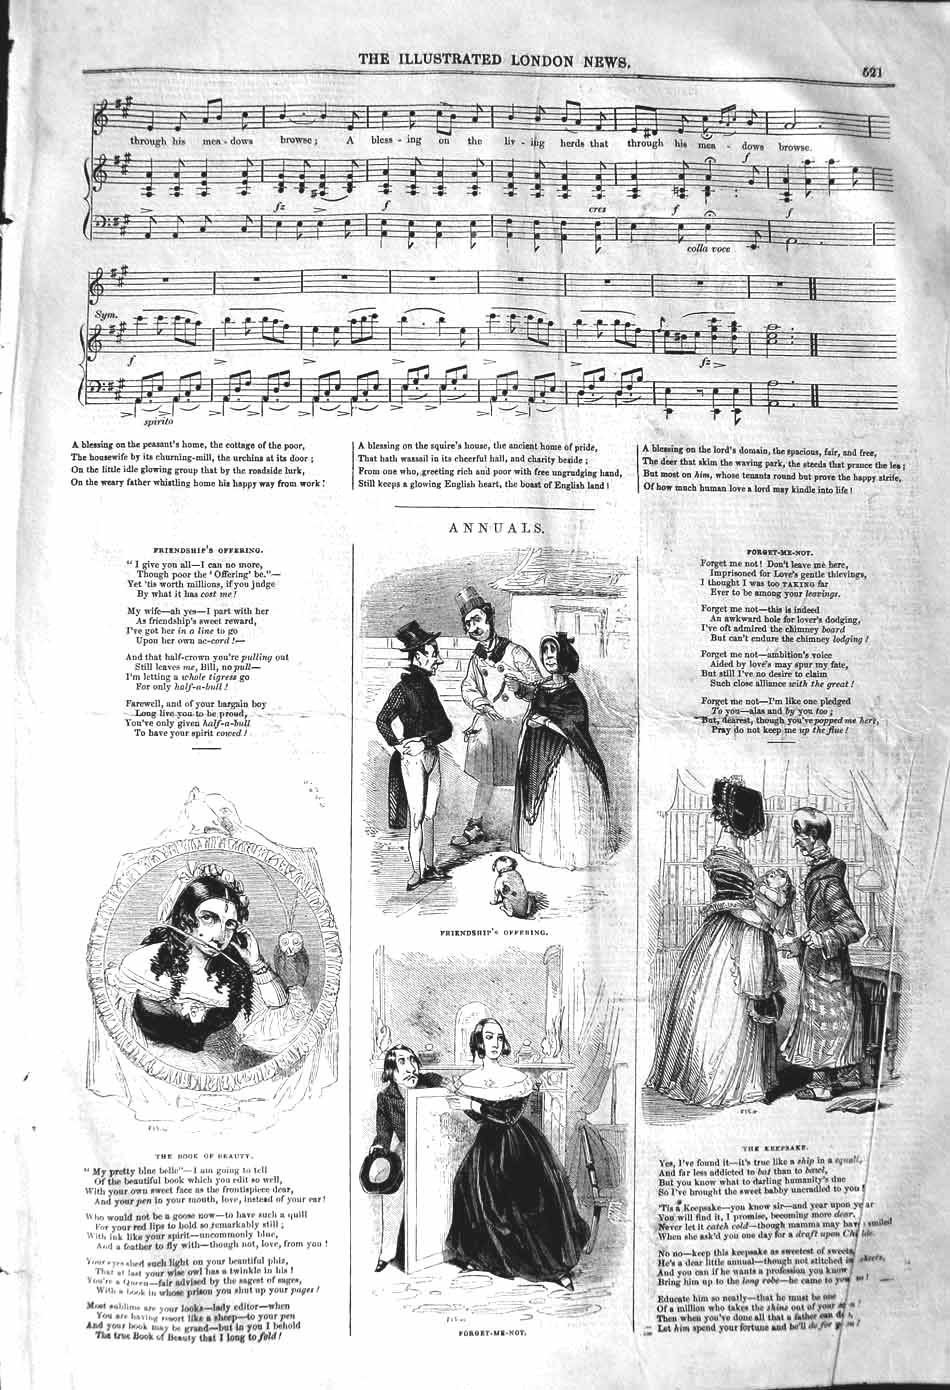 File:ILN 1842, p  521 jpg - Wikimedia Commons